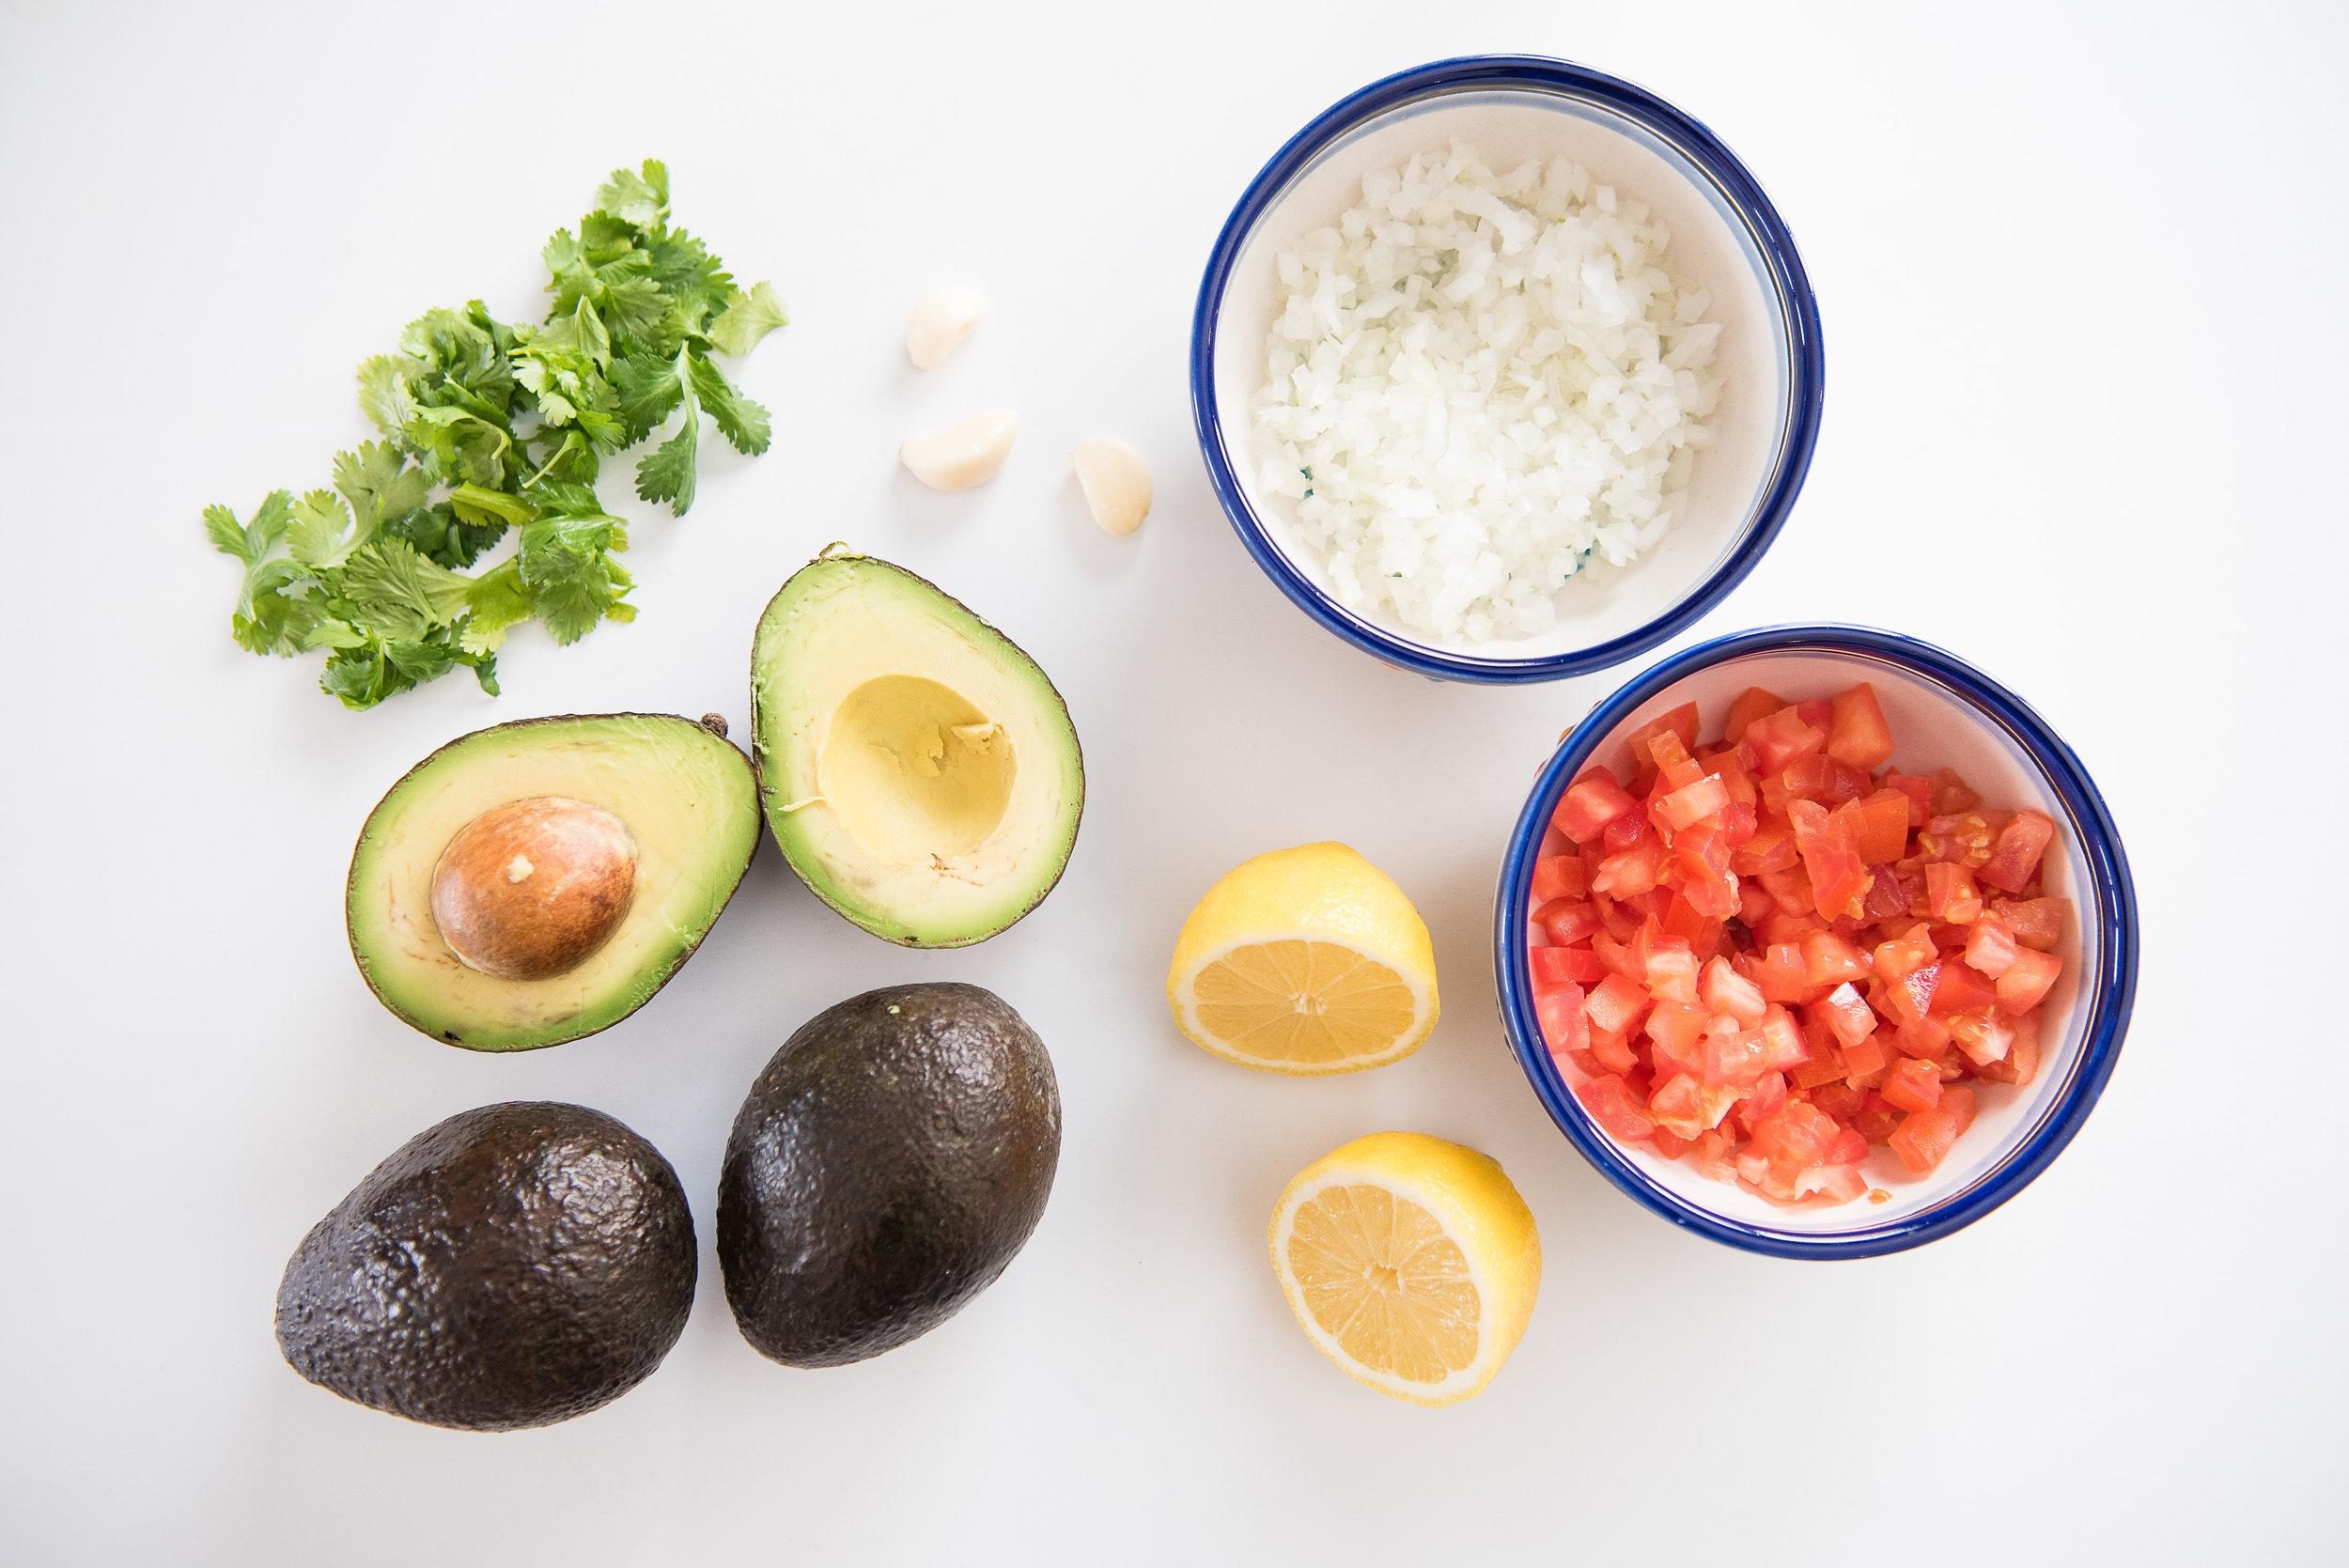 mexican-food-appetizer-easy-guacamole-karina-mora-prints-1.jpg